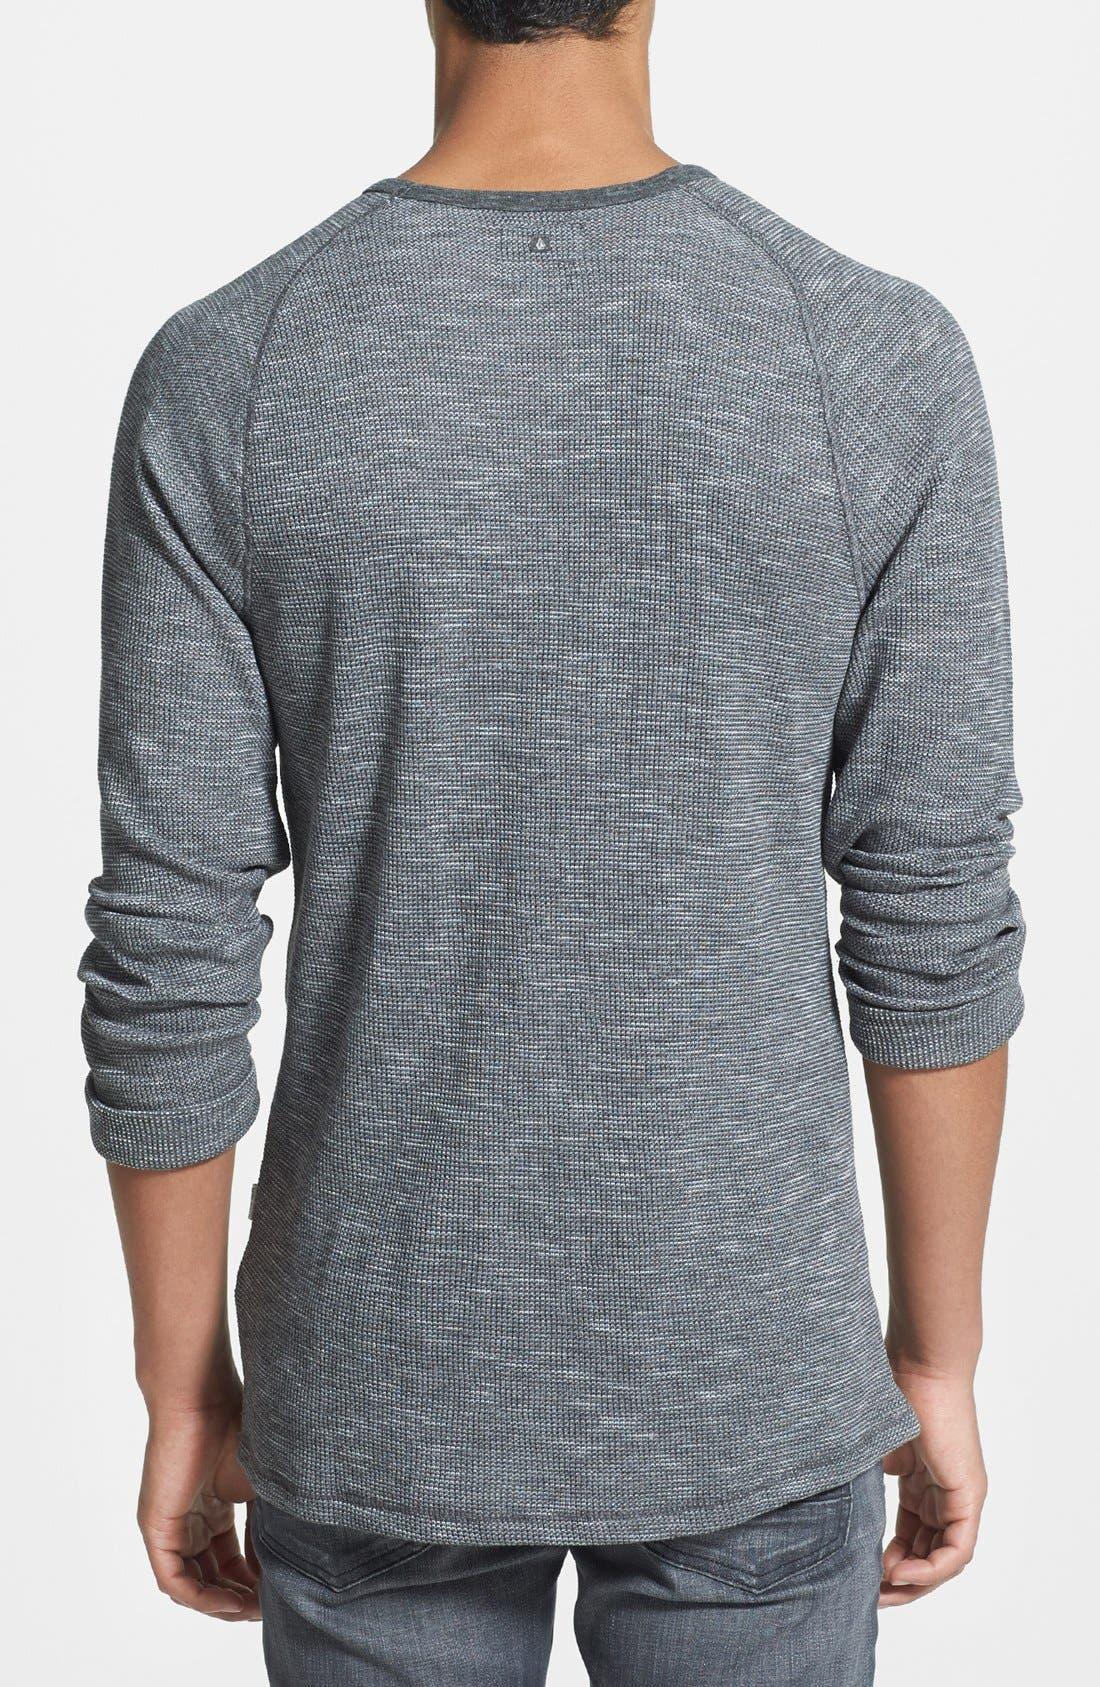 VOLCOM,                             'Upgrade' Slim Fit Long Sleeve Thermal Shirt,                             Alternate thumbnail 2, color,                             020